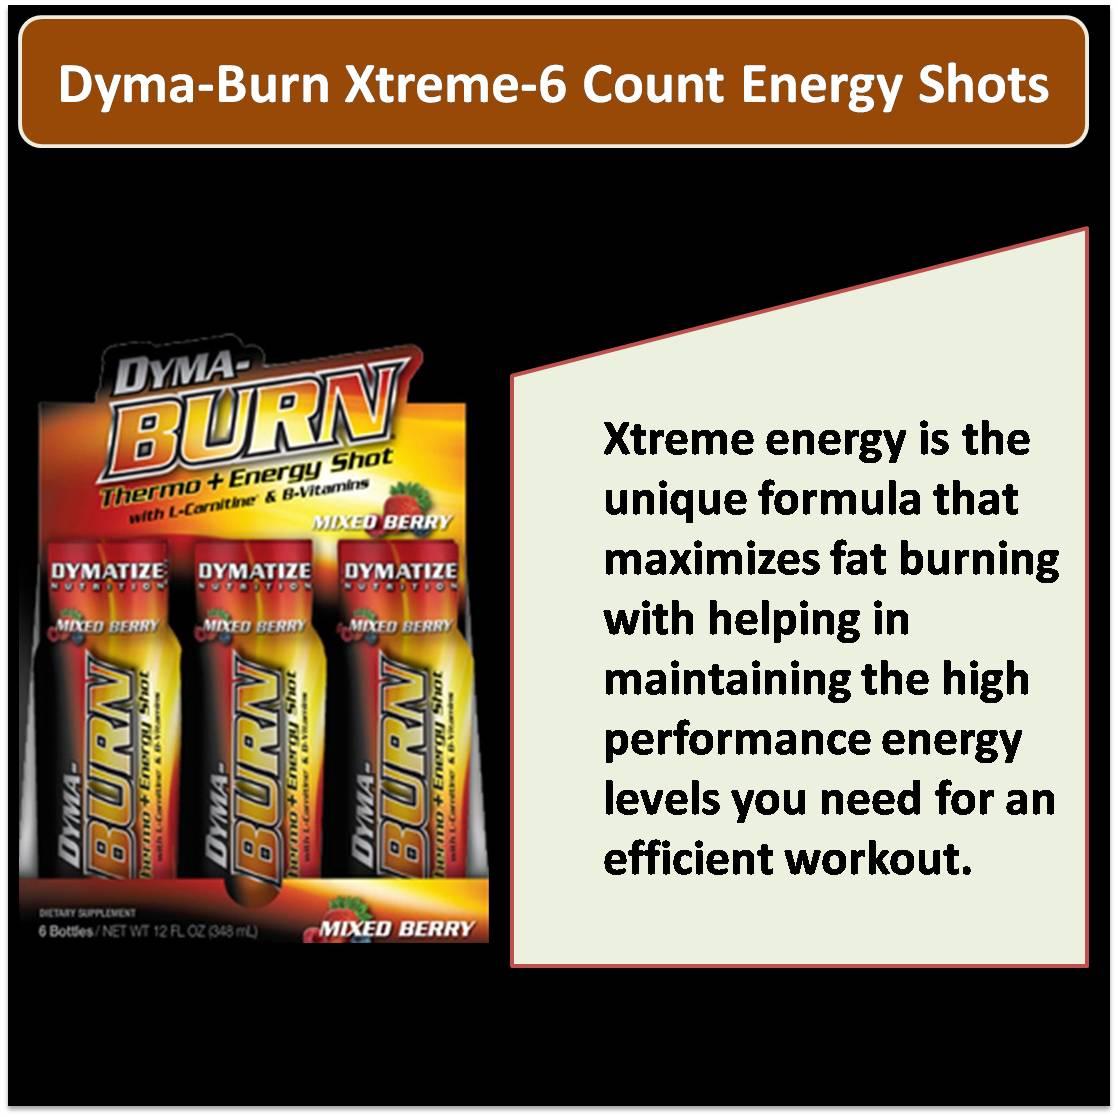 Dyma Burn Xtreme 6 Count Energy Shots